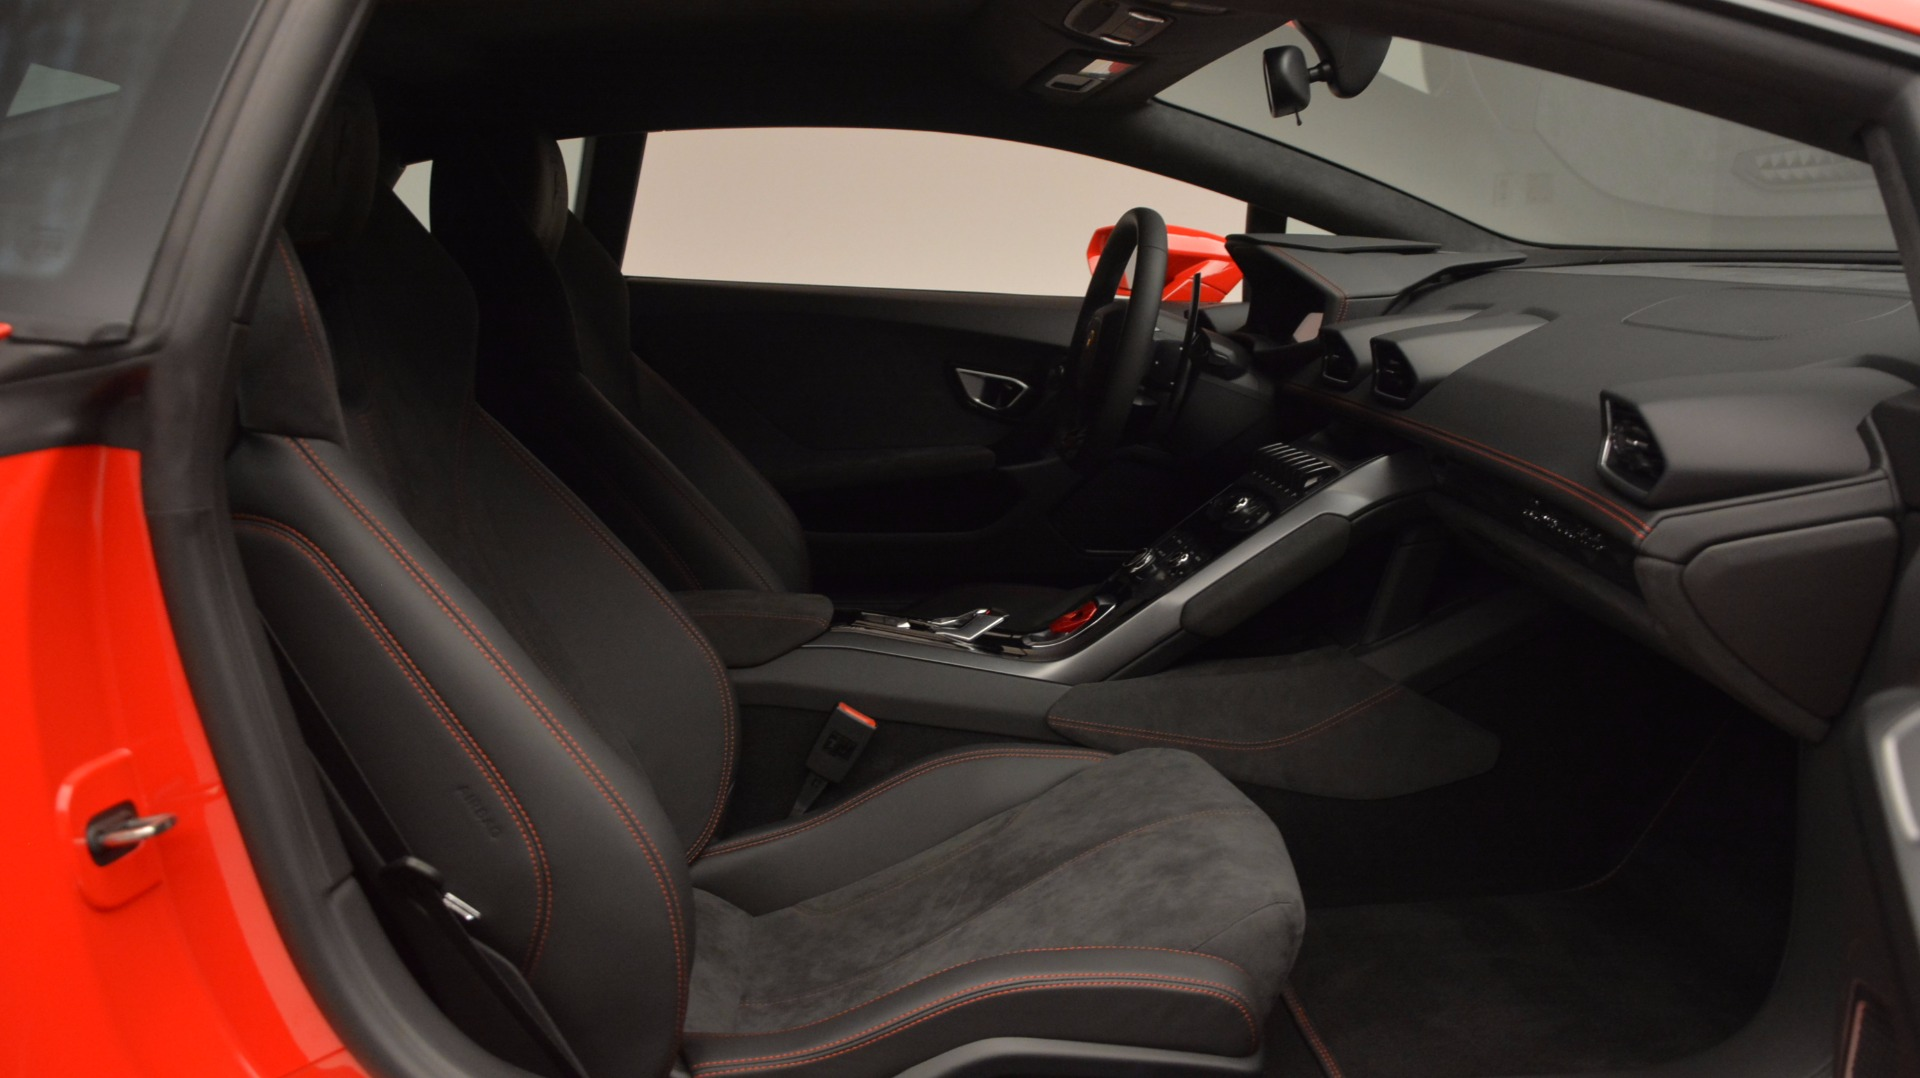 Used 2016 Lamborghini Huracan LP 580-2 For Sale In Greenwich, CT. Alfa Romeo of Greenwich, 7184 1070_p32